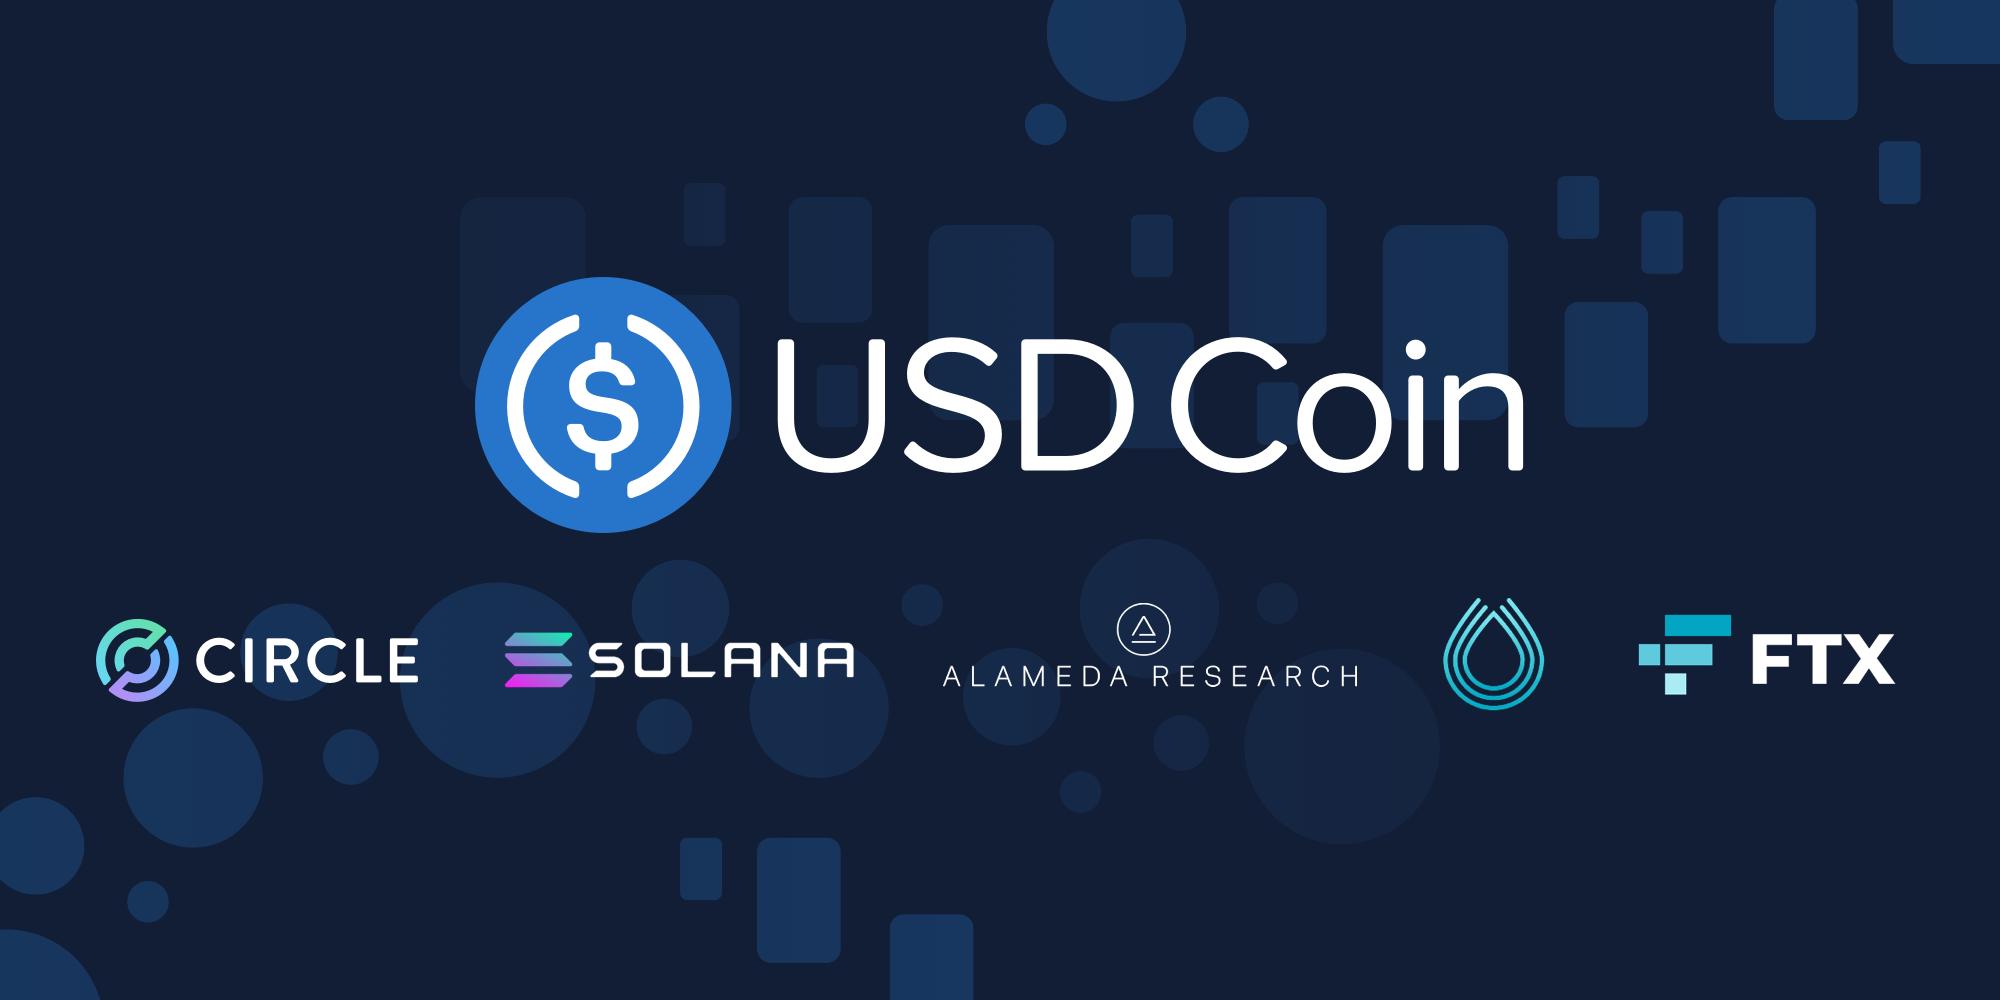 usdc ftx alameda - Solana به چهارمین شبکه ی بلاک چینی تبدیل می شود که از استیبل کوین USDC پشتیبانی می کند!